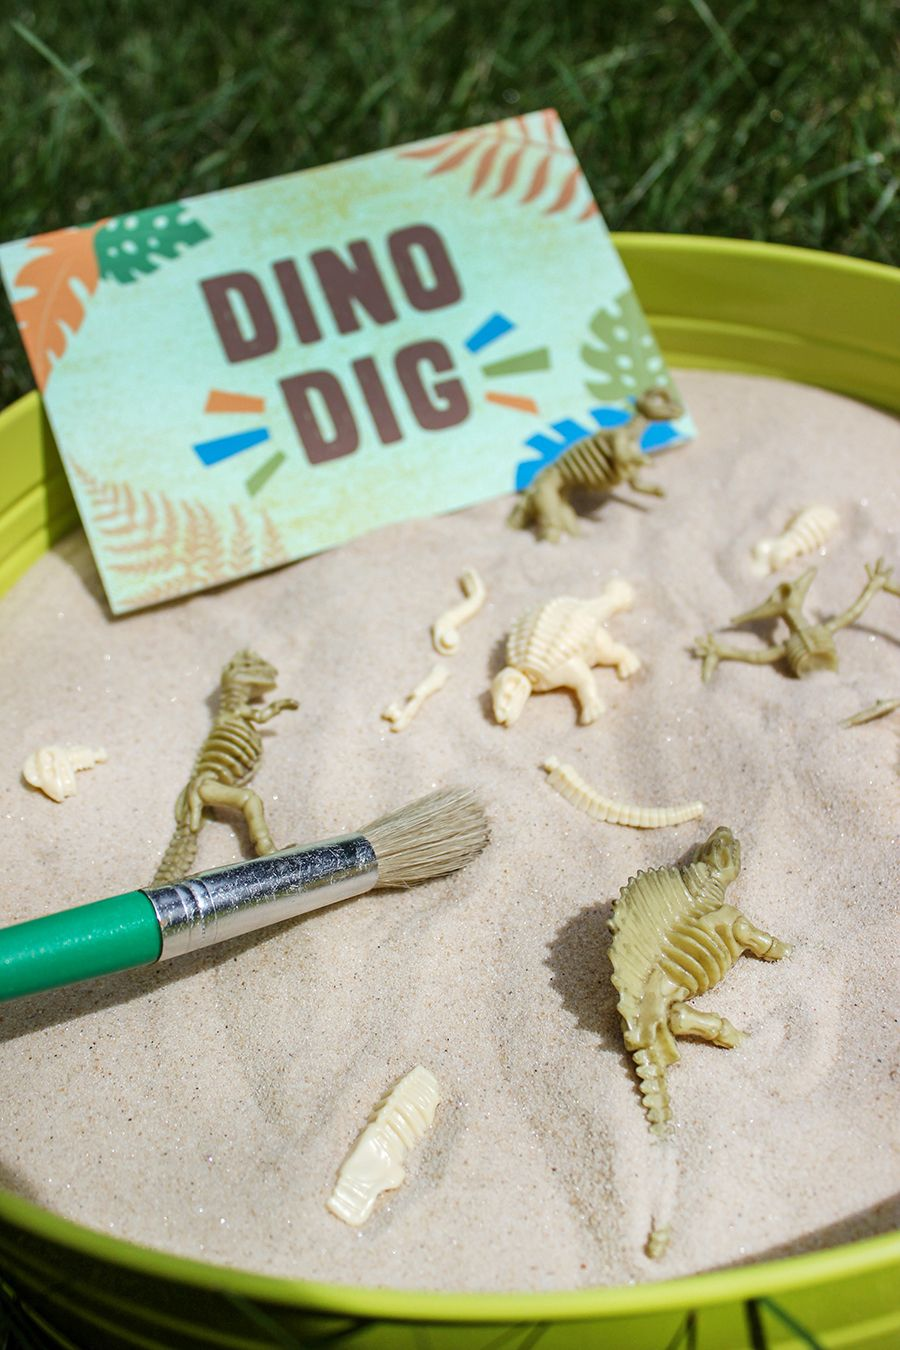 25 Best Dinosaur Birthday Party Ideas How To Throw A Dinosaur Themed Birthday Party